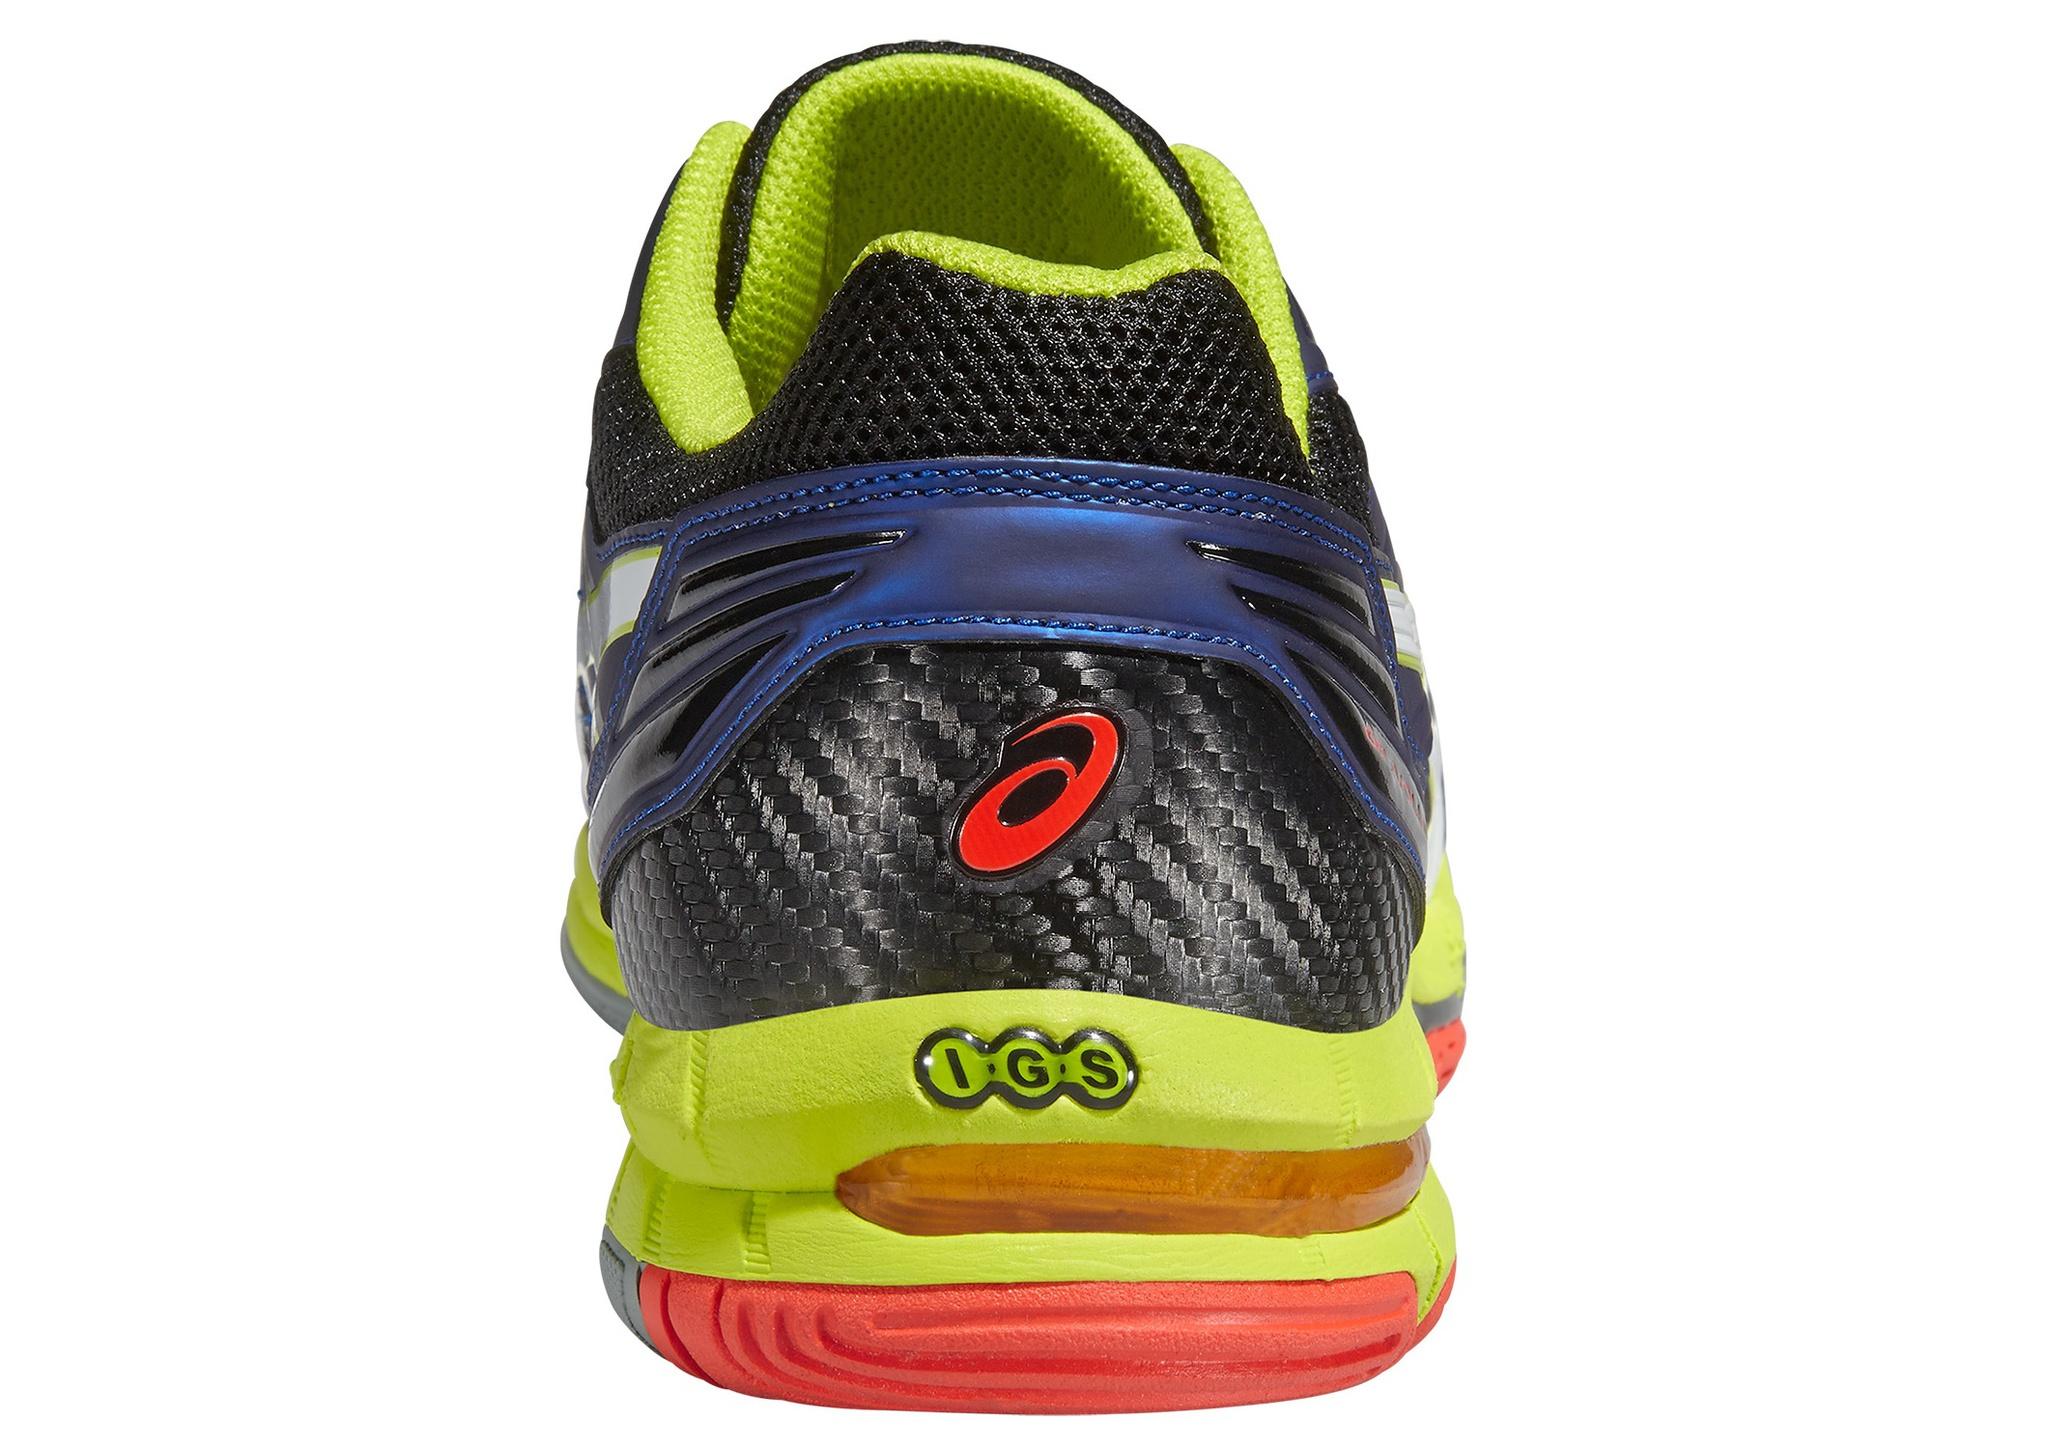 Мужские кроссовки для волейбола Асикс Gel-Volley Elite 3 (B500N 5001) синие фото